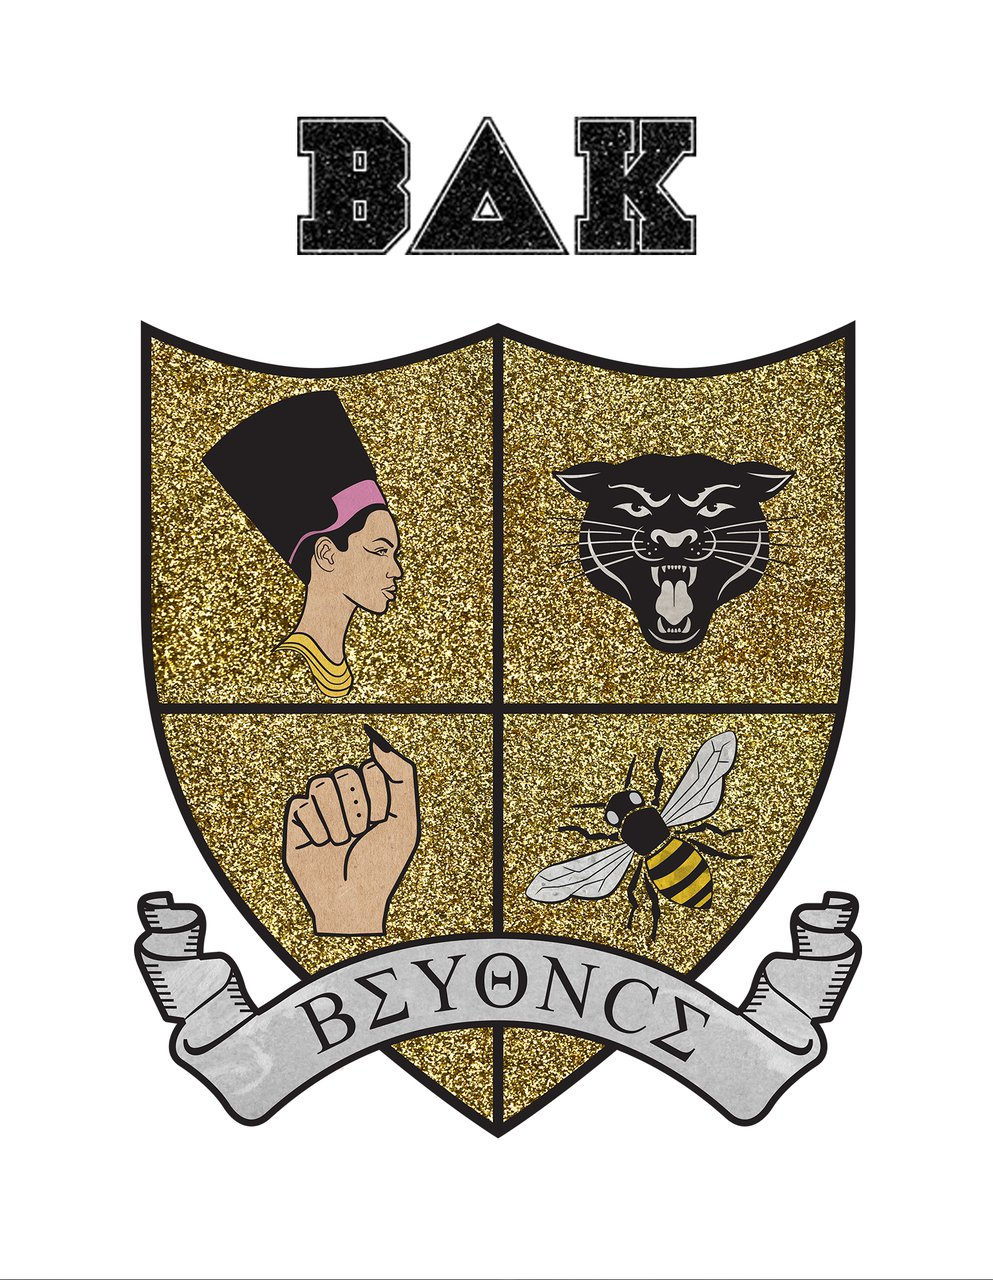 Beyoncé Announces HBCU Scholarship Program Following Her Historic Headlining Show At Coachella